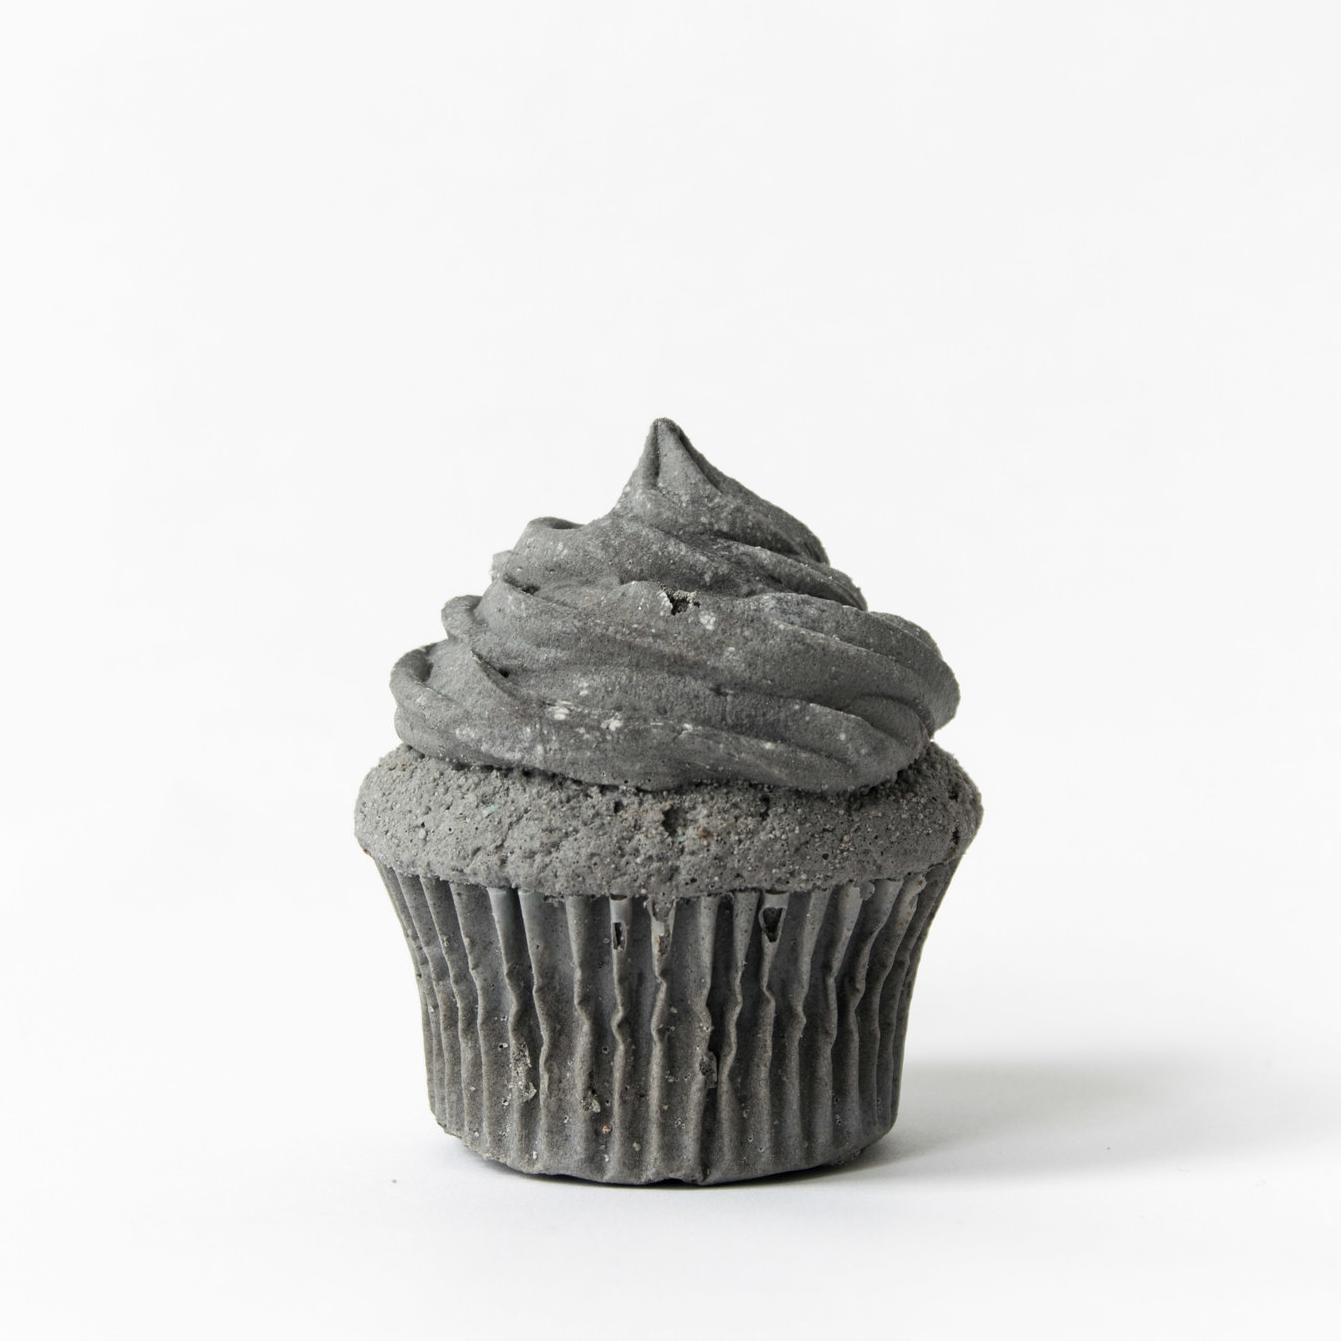 "Spencer Merolla ""Cupcake"" / 2017 / coal ash, resin / 2.5"" x 2.5"" x 3""   http://www.spencermerolla.com"